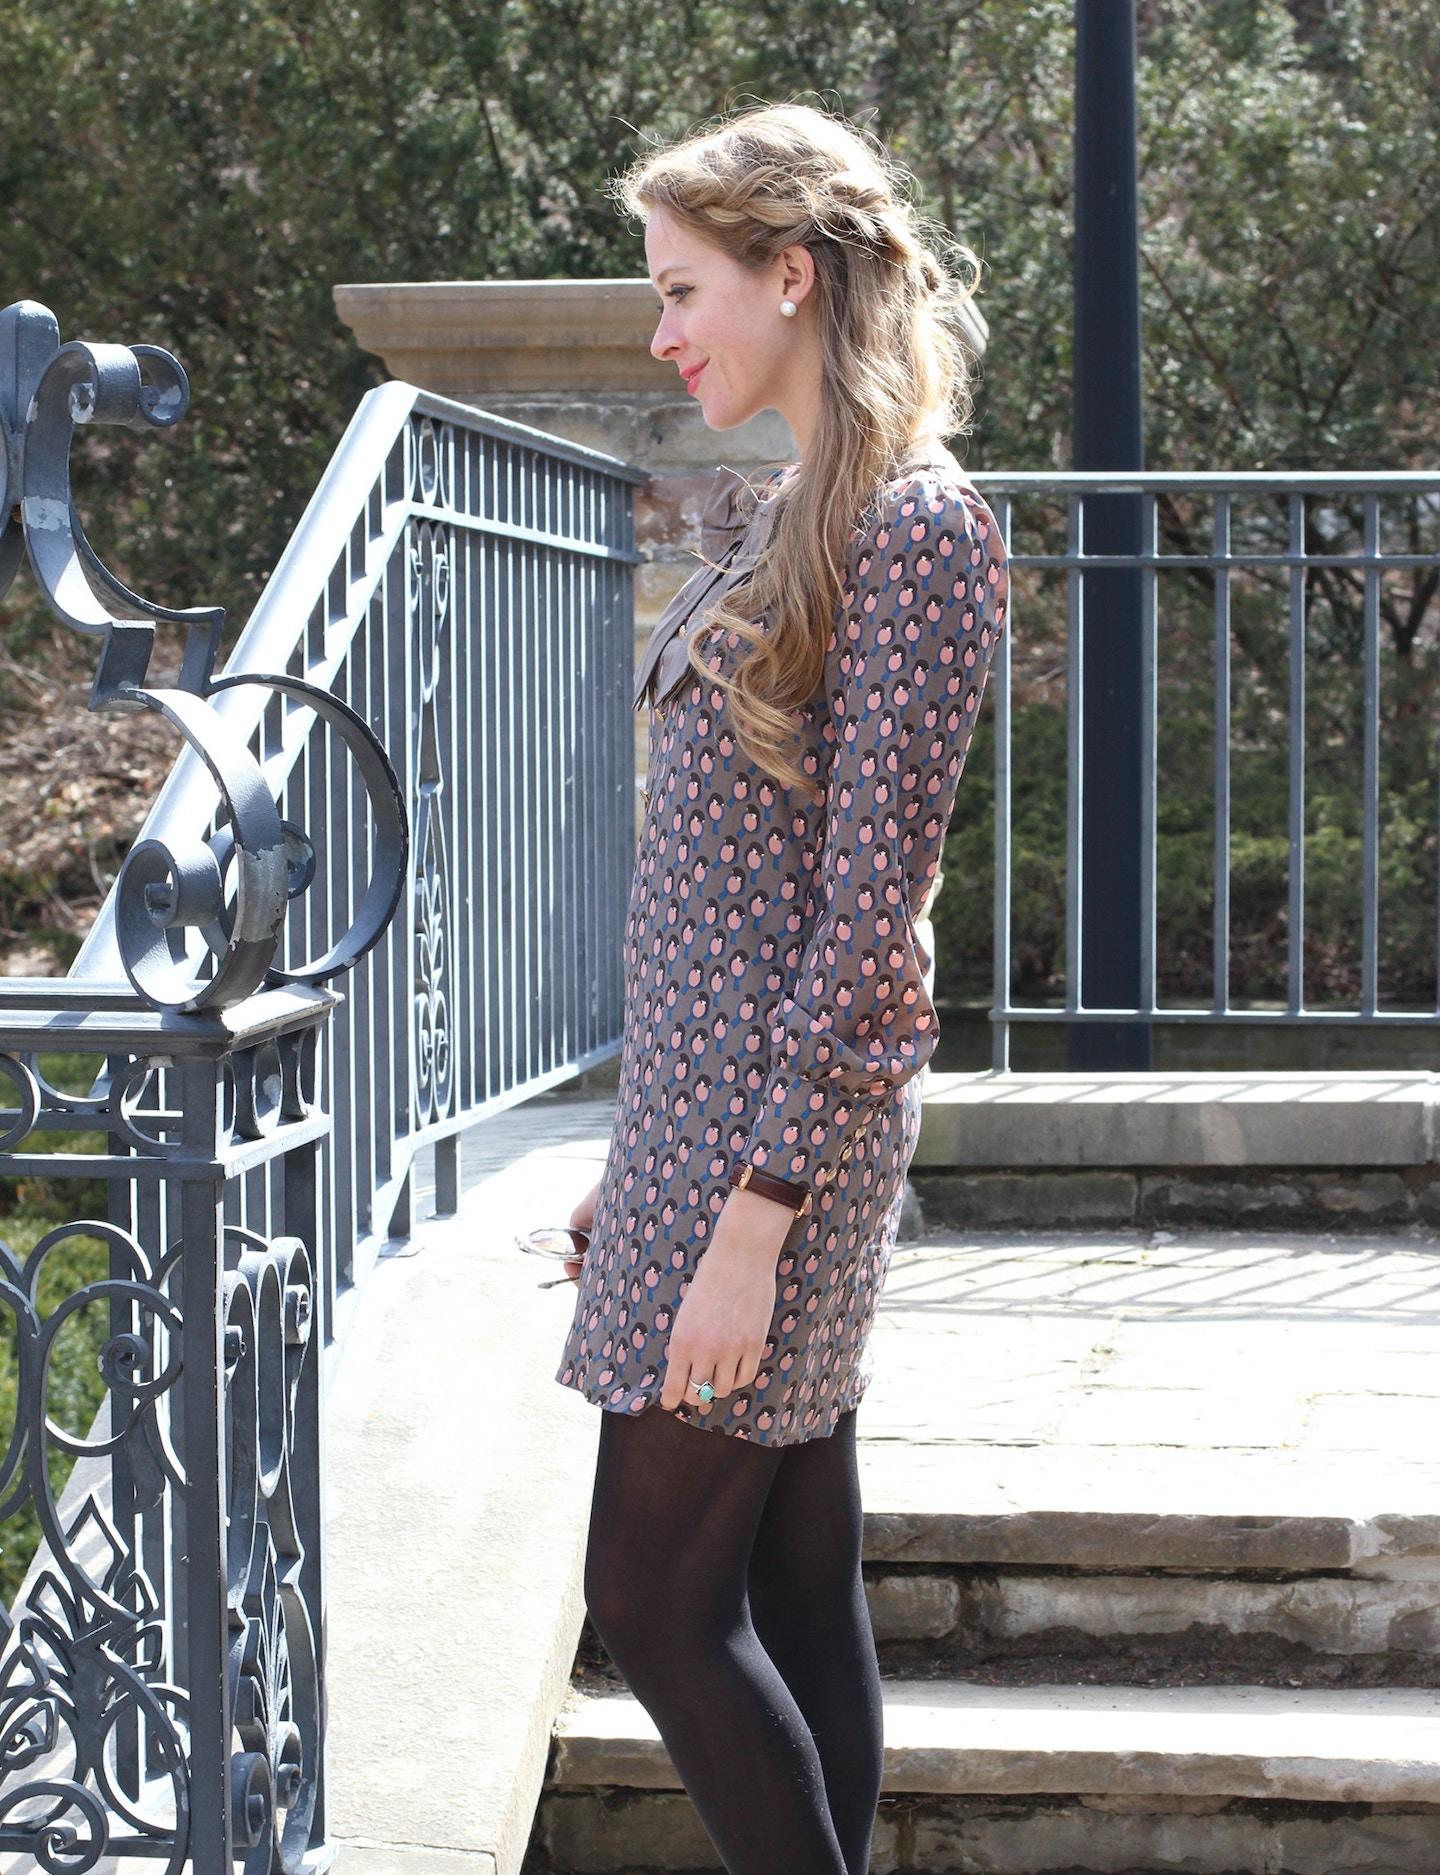 Bird printed spring dress + dutch braid crown tutorial